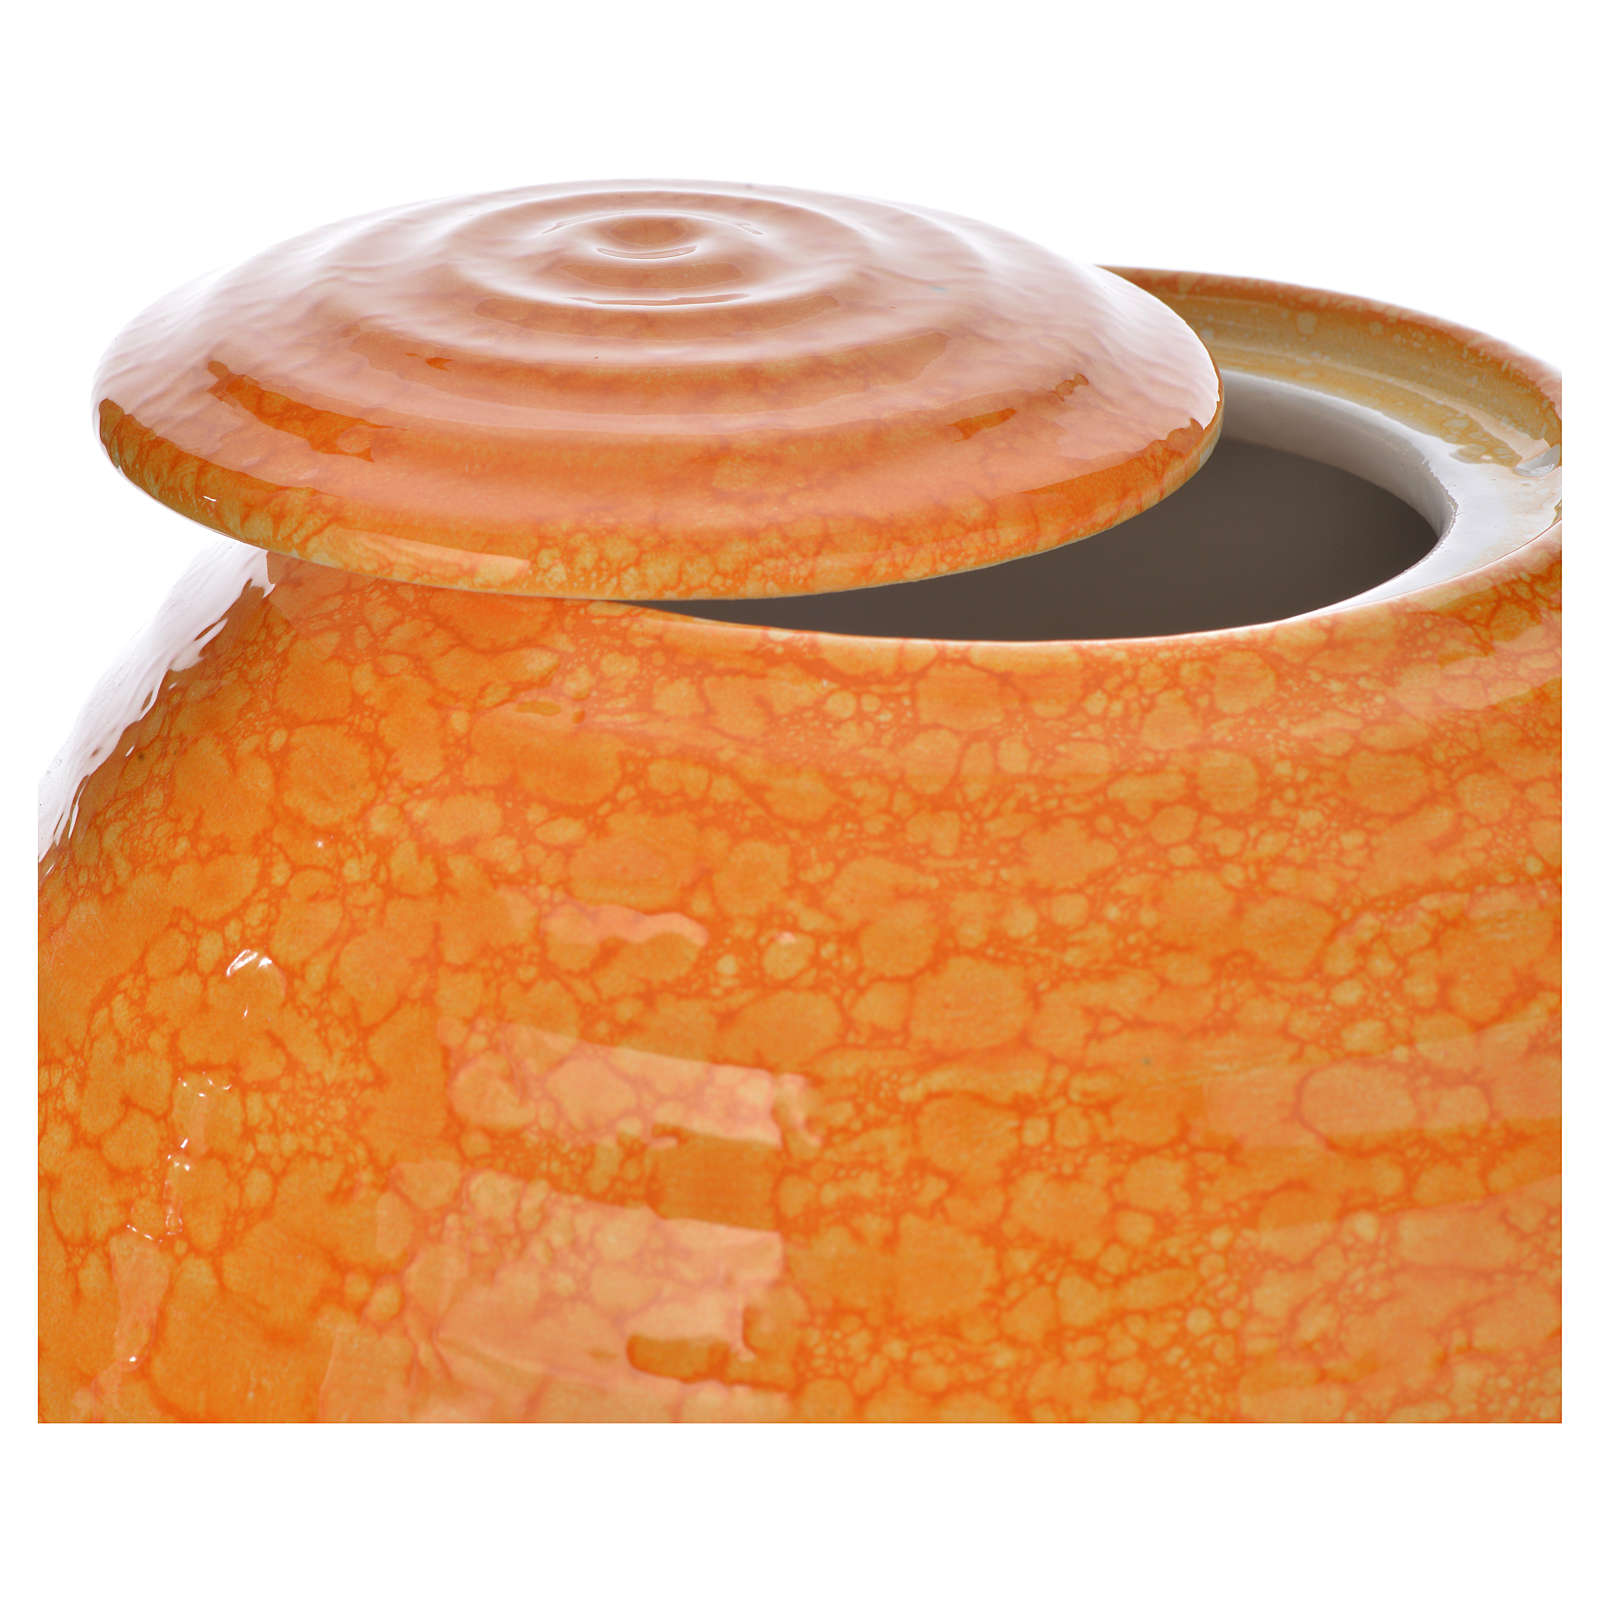 Urna cineraria porcellana smalto mod. Murano Arancio 3